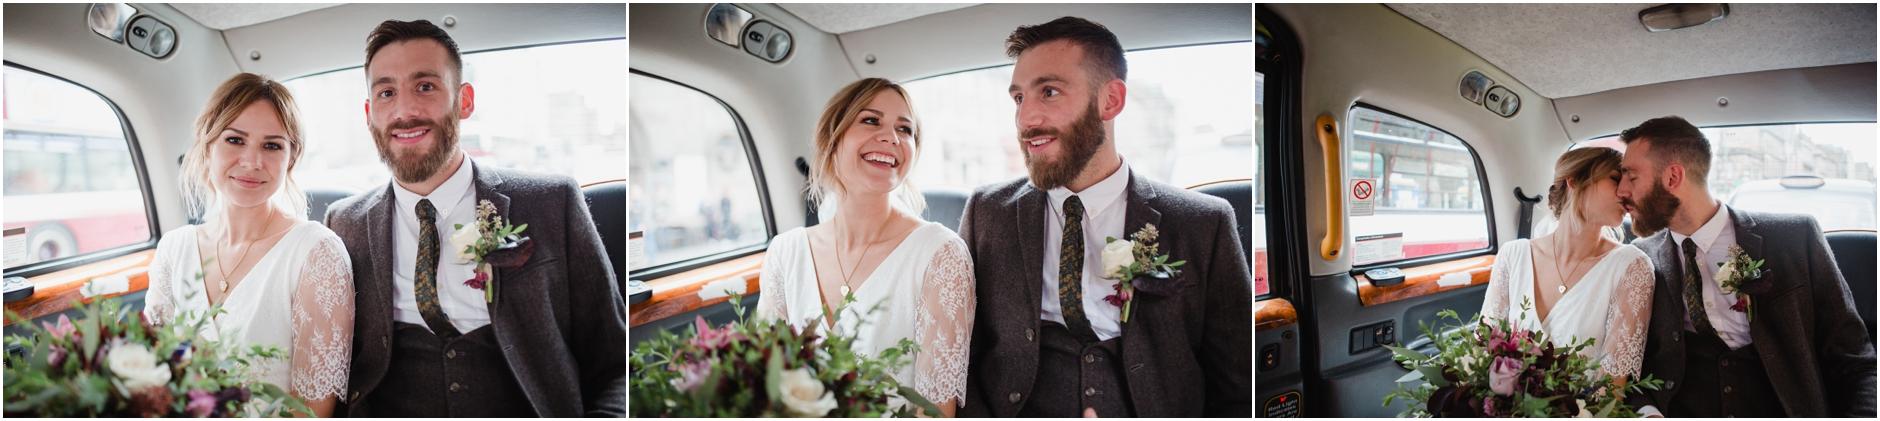 small edinburgh wedding elopement photographer